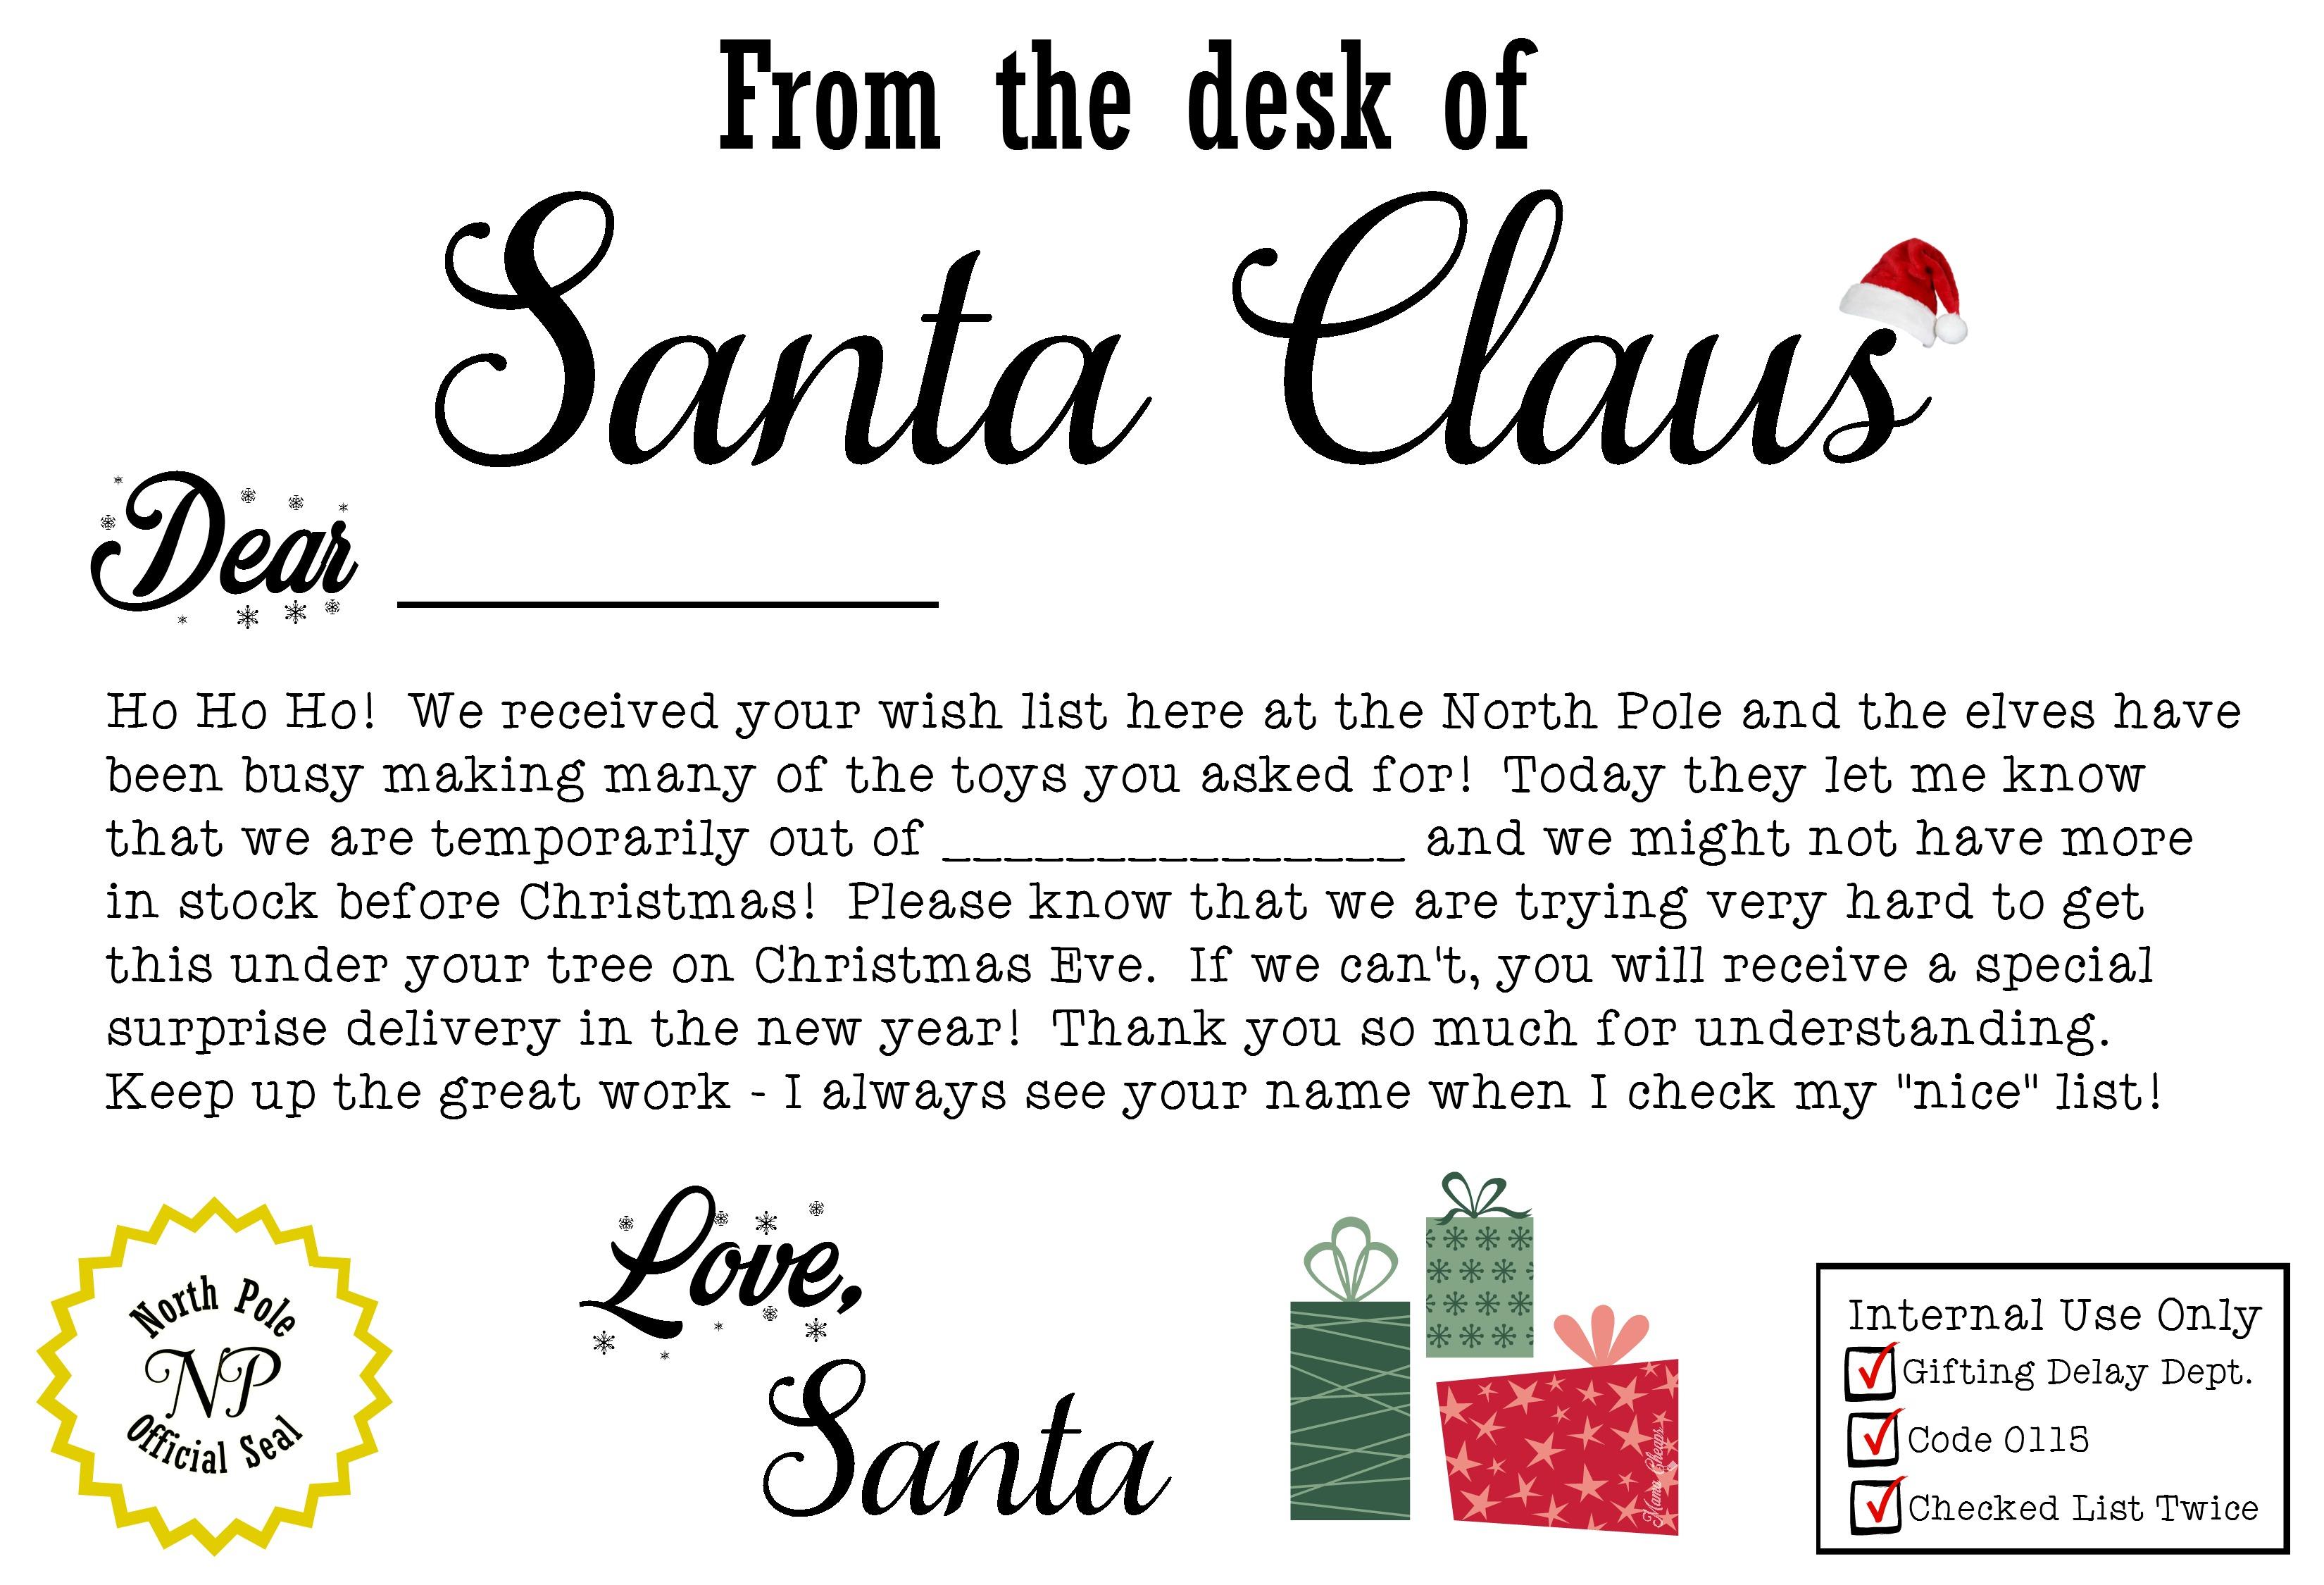 Free Santa Claus Christmas Present Iou Printable Letter | Mama Cheaps - Free Printable Christmas Letters From Santa